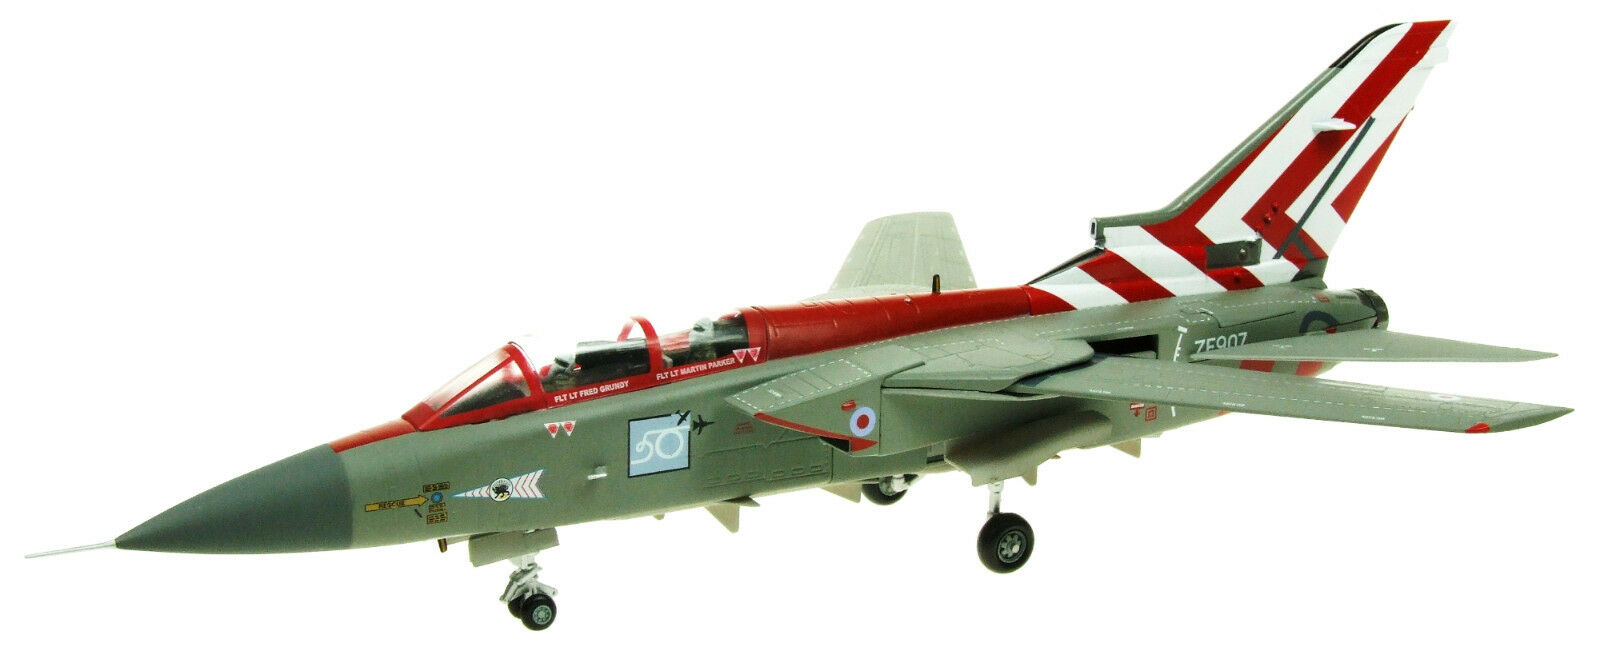 AV7251001 1 72 Panavia Tornado F3 ZE907 65 SQD. Raf coningsby Display AEREI